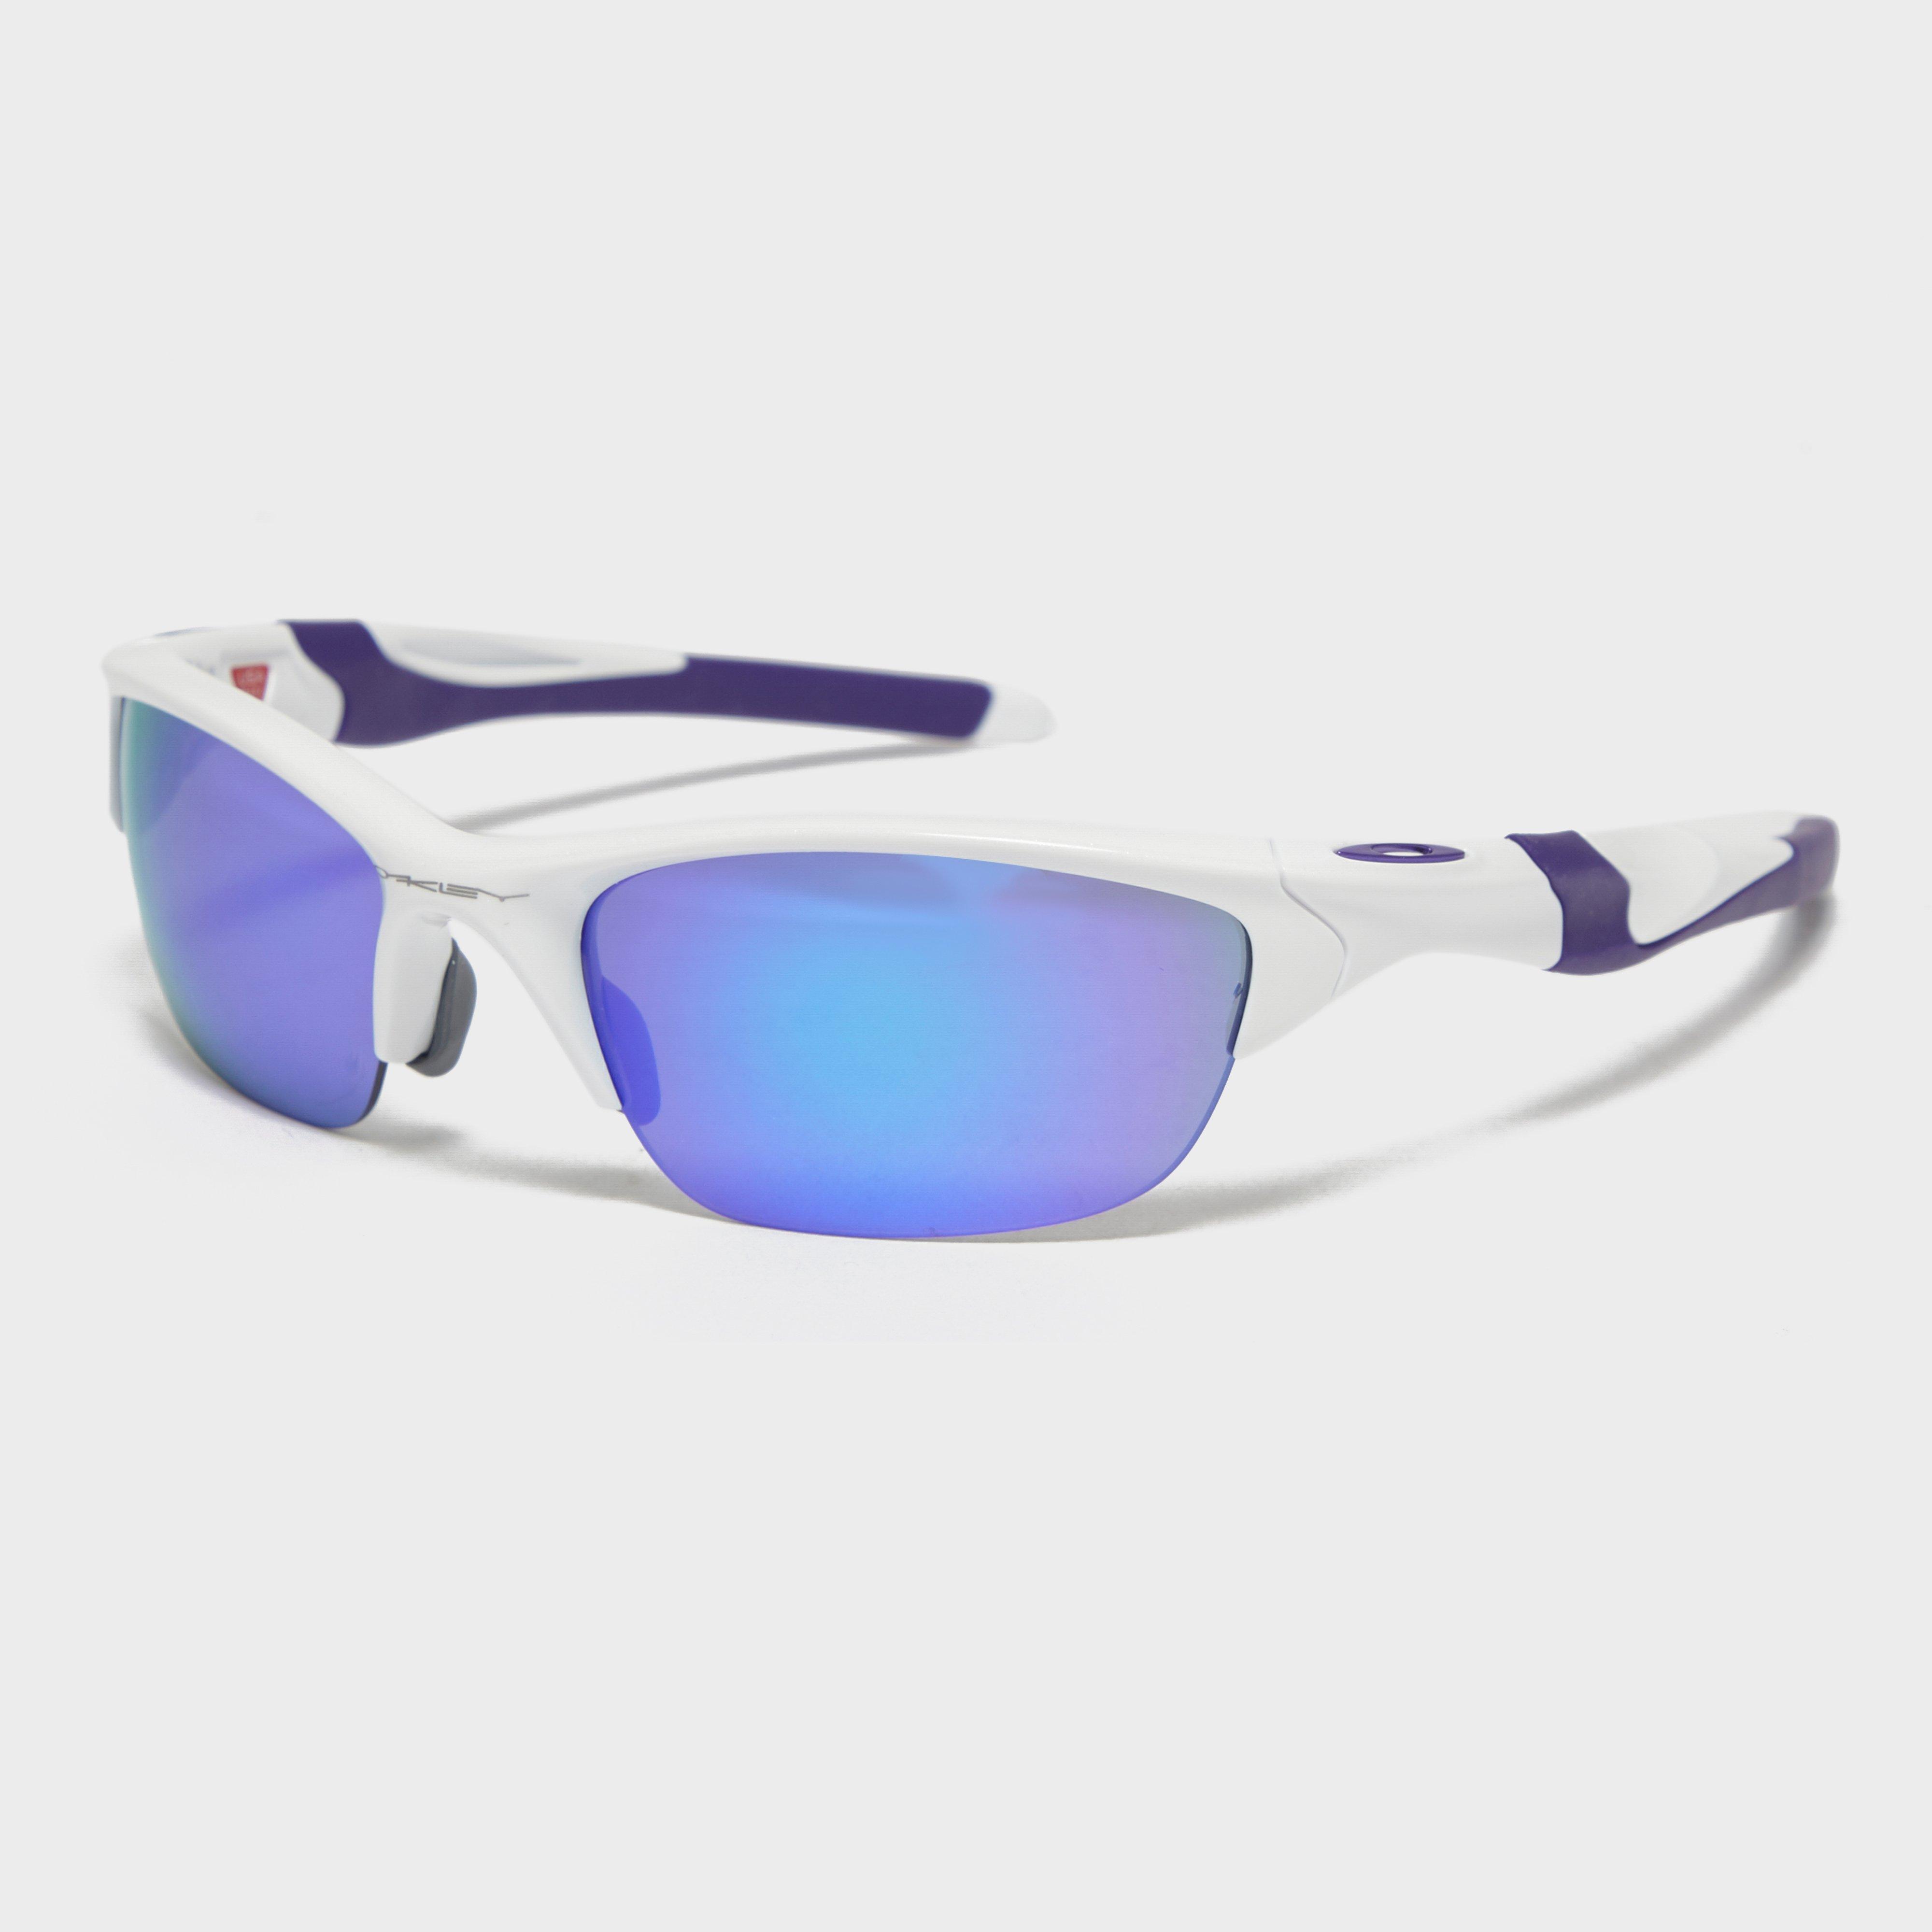 Oakley Half Jacket 2.0 Sunglasses, Multi